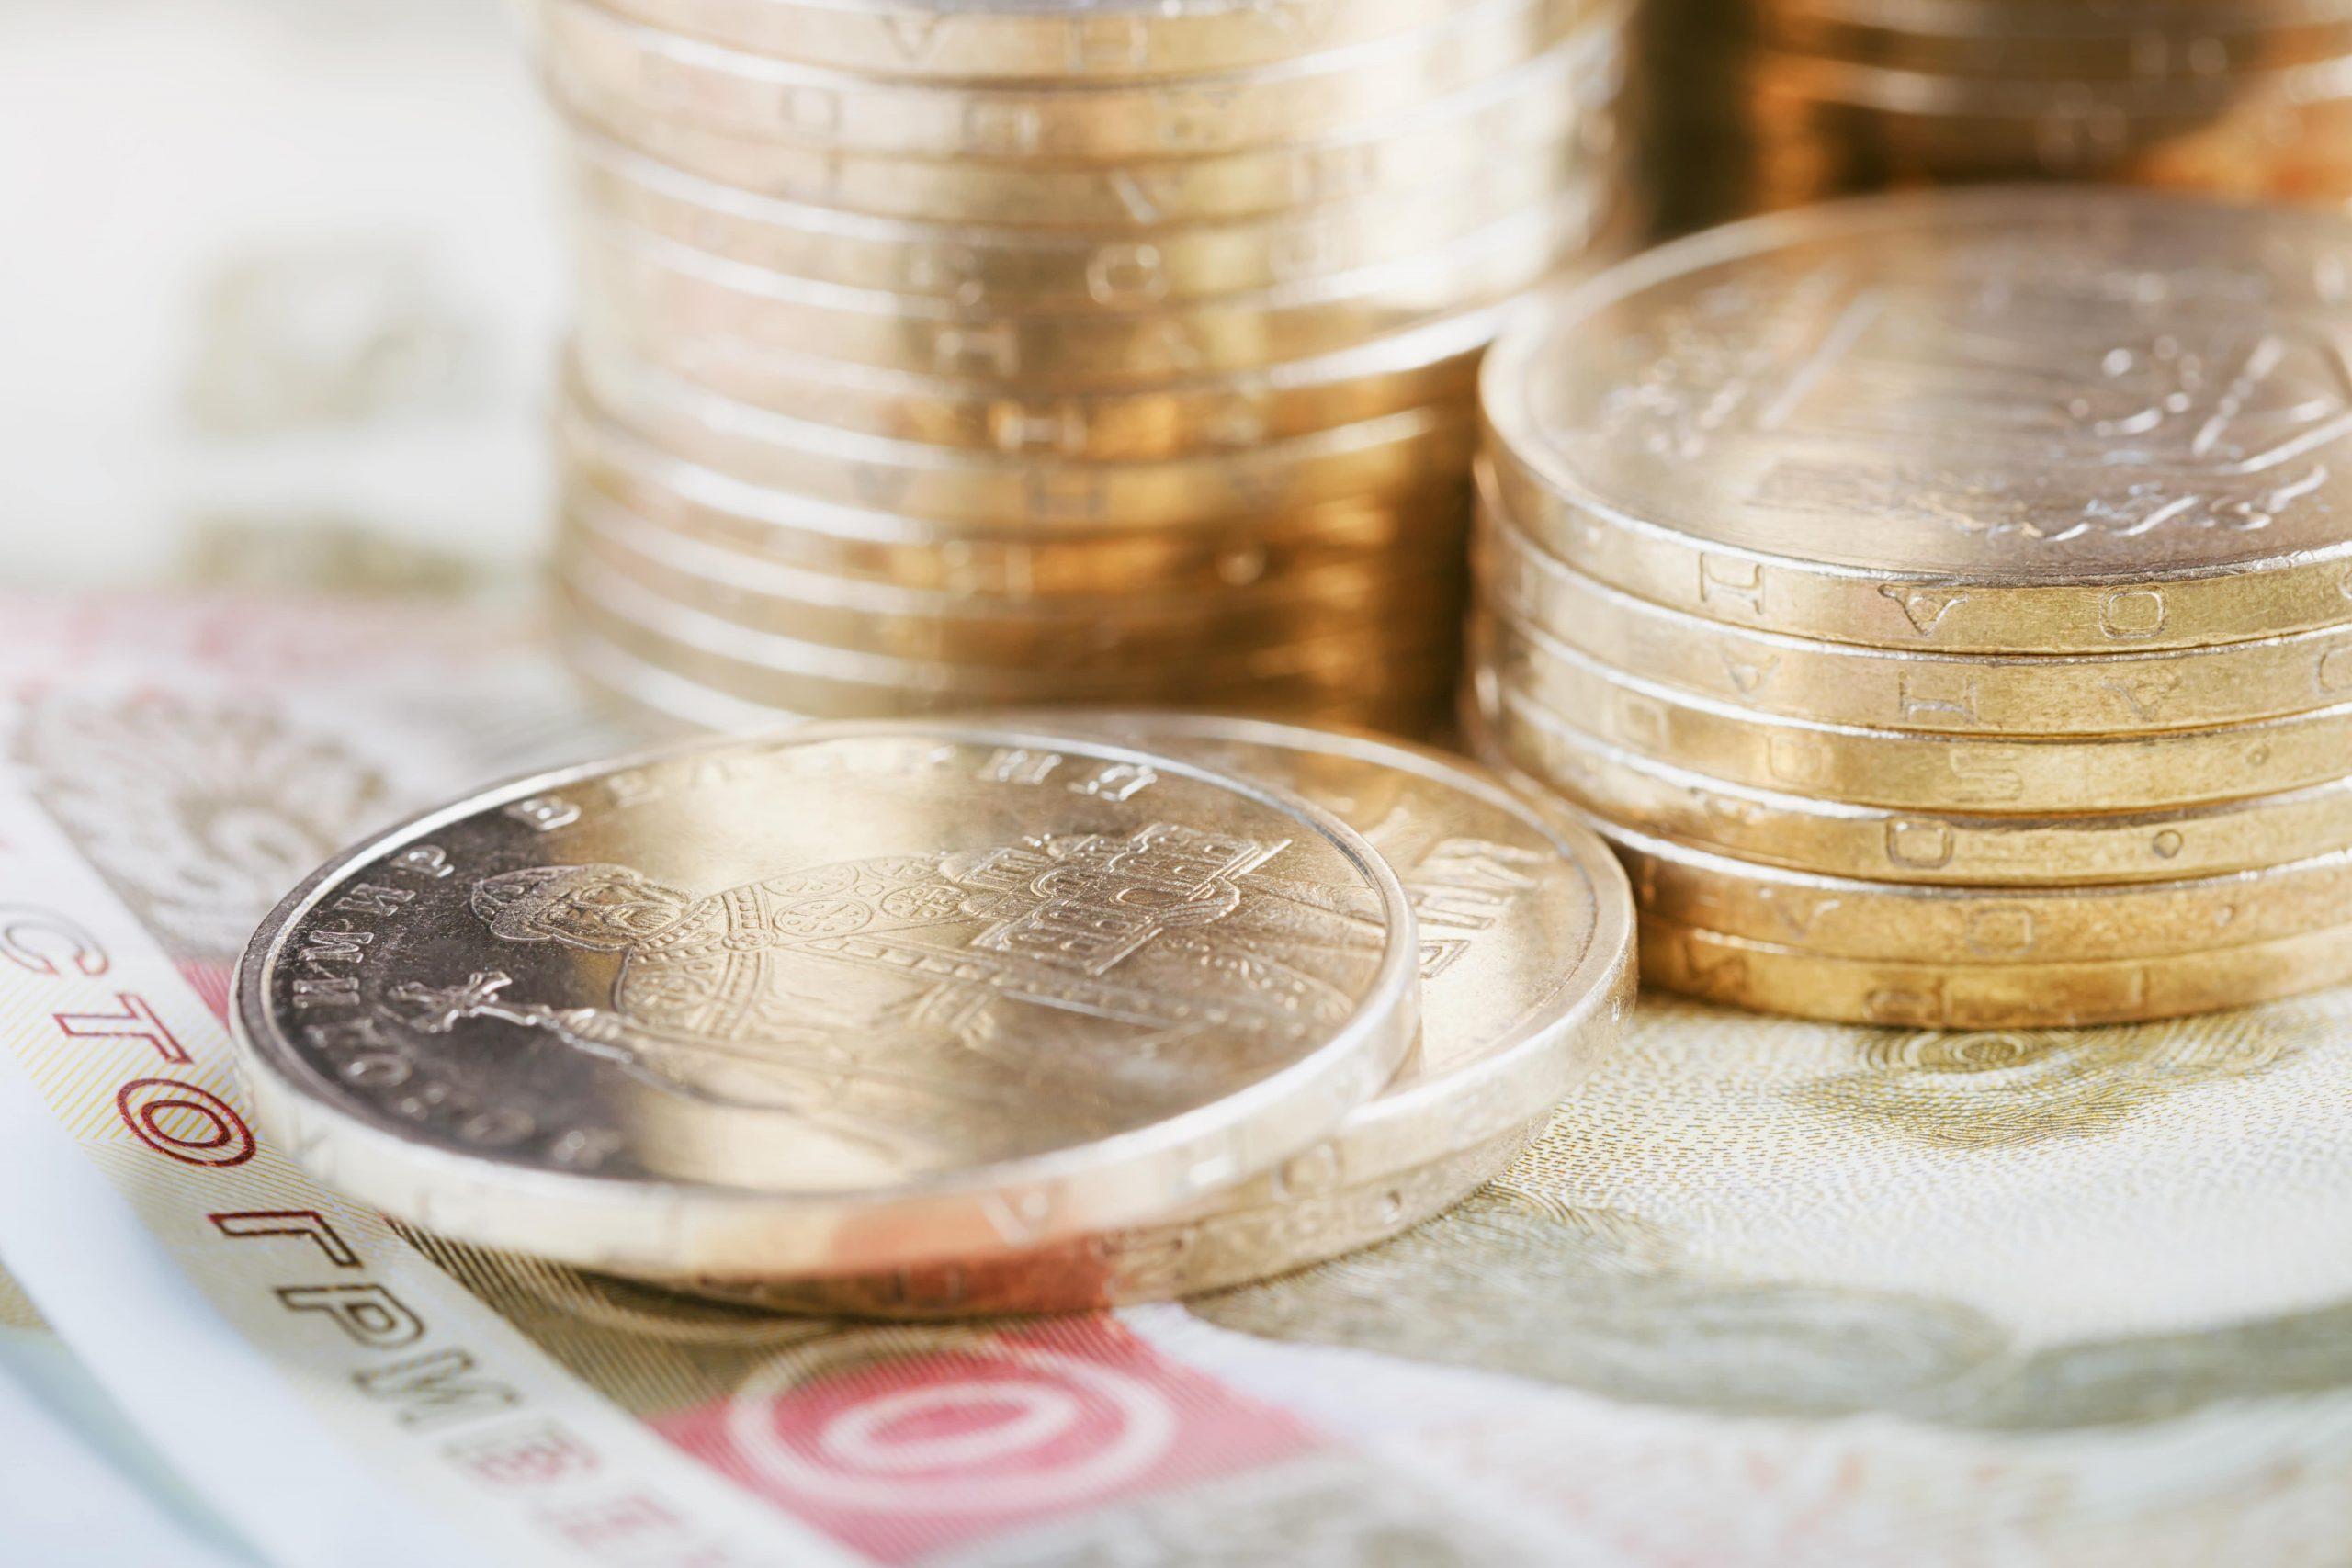 financial-background-with-ukrainian-money-RUADYQA-min